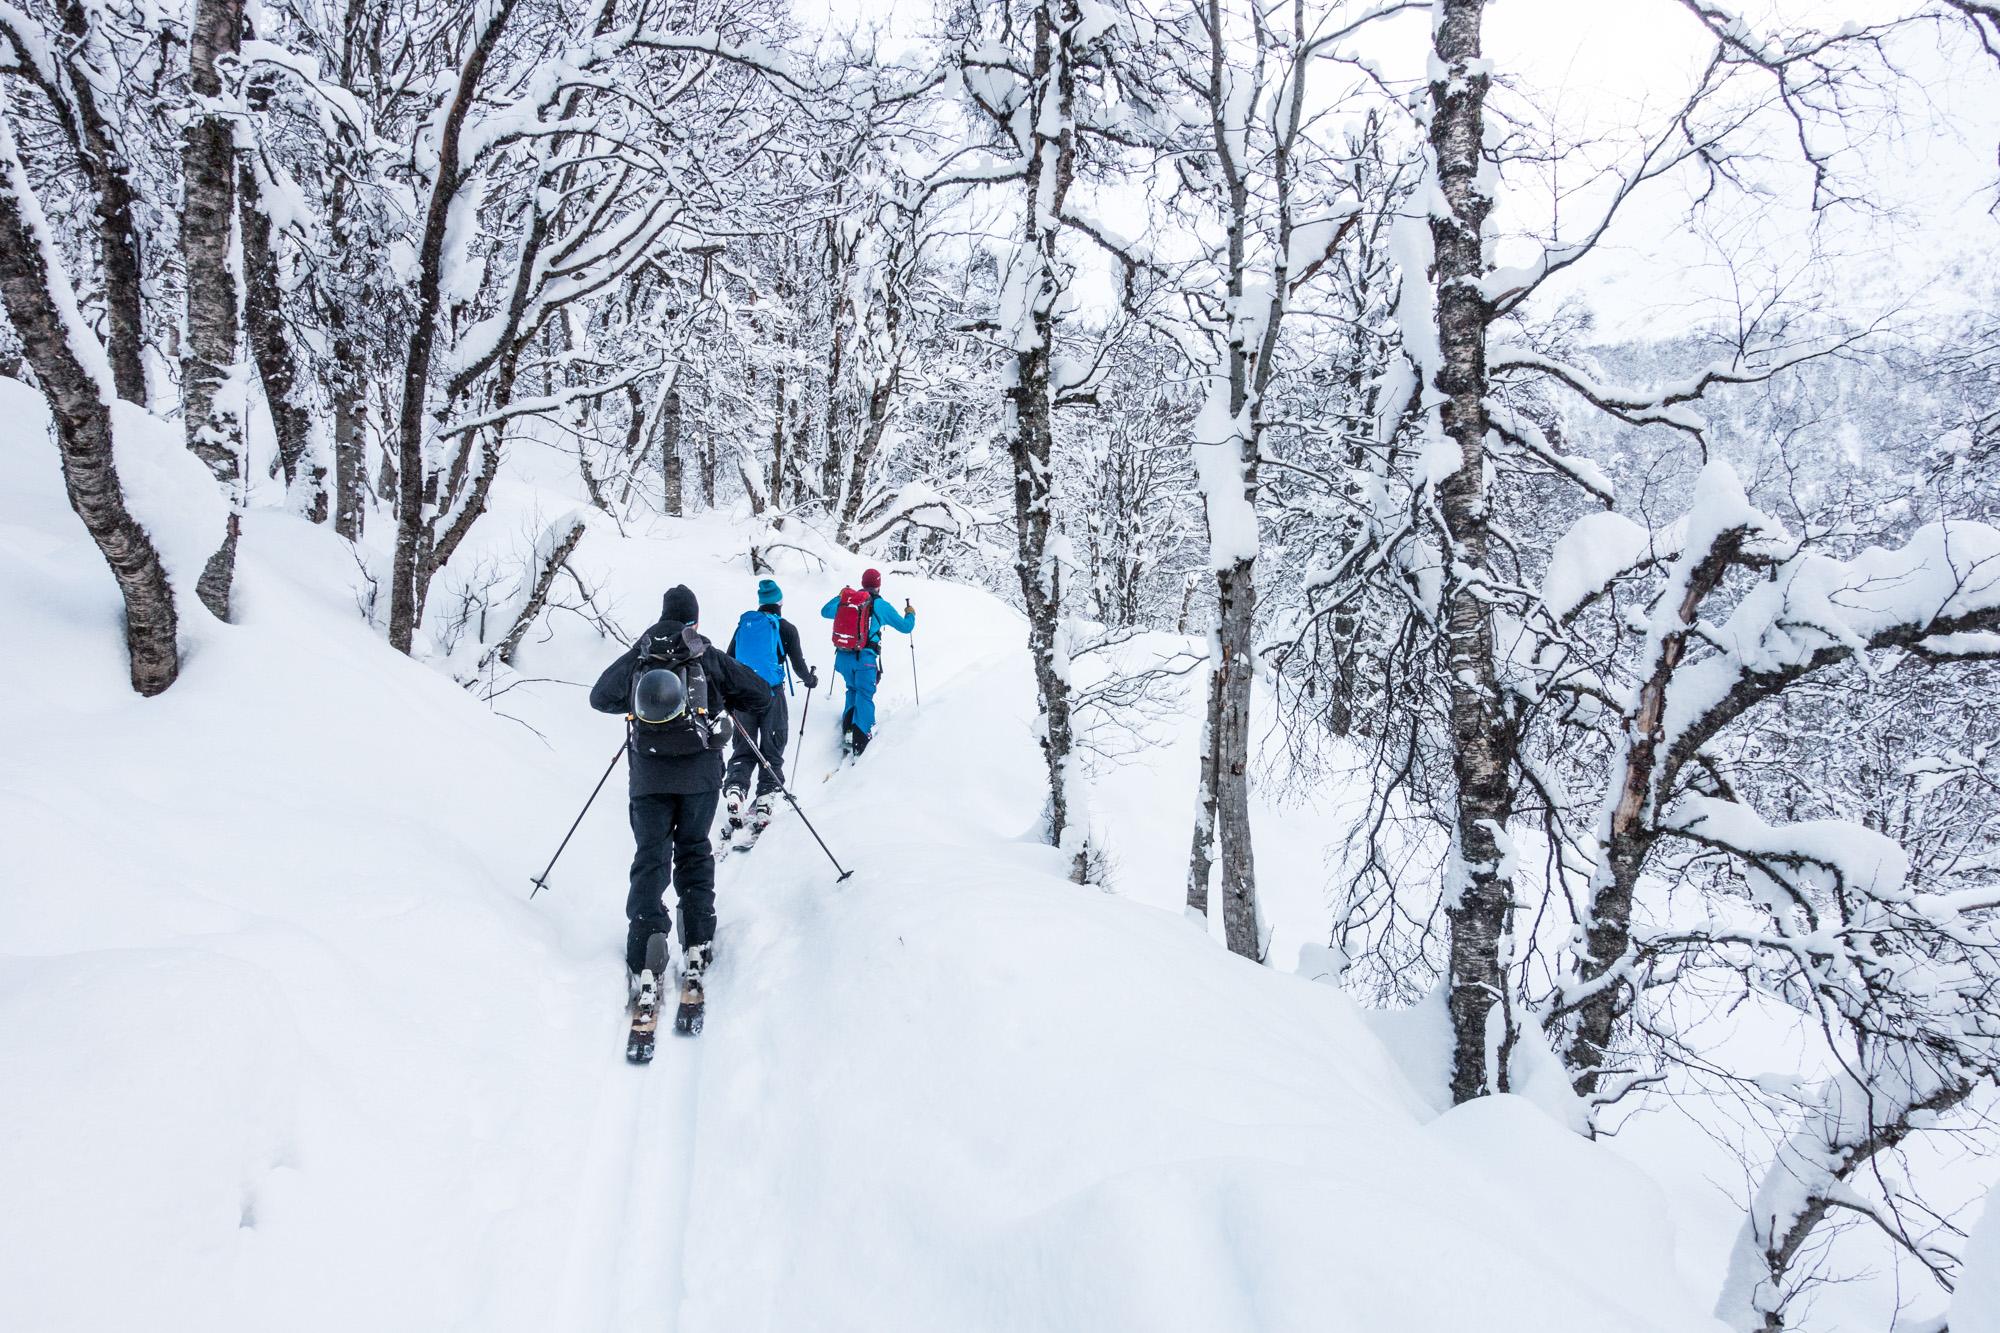 Snow, snow, snow and trees.